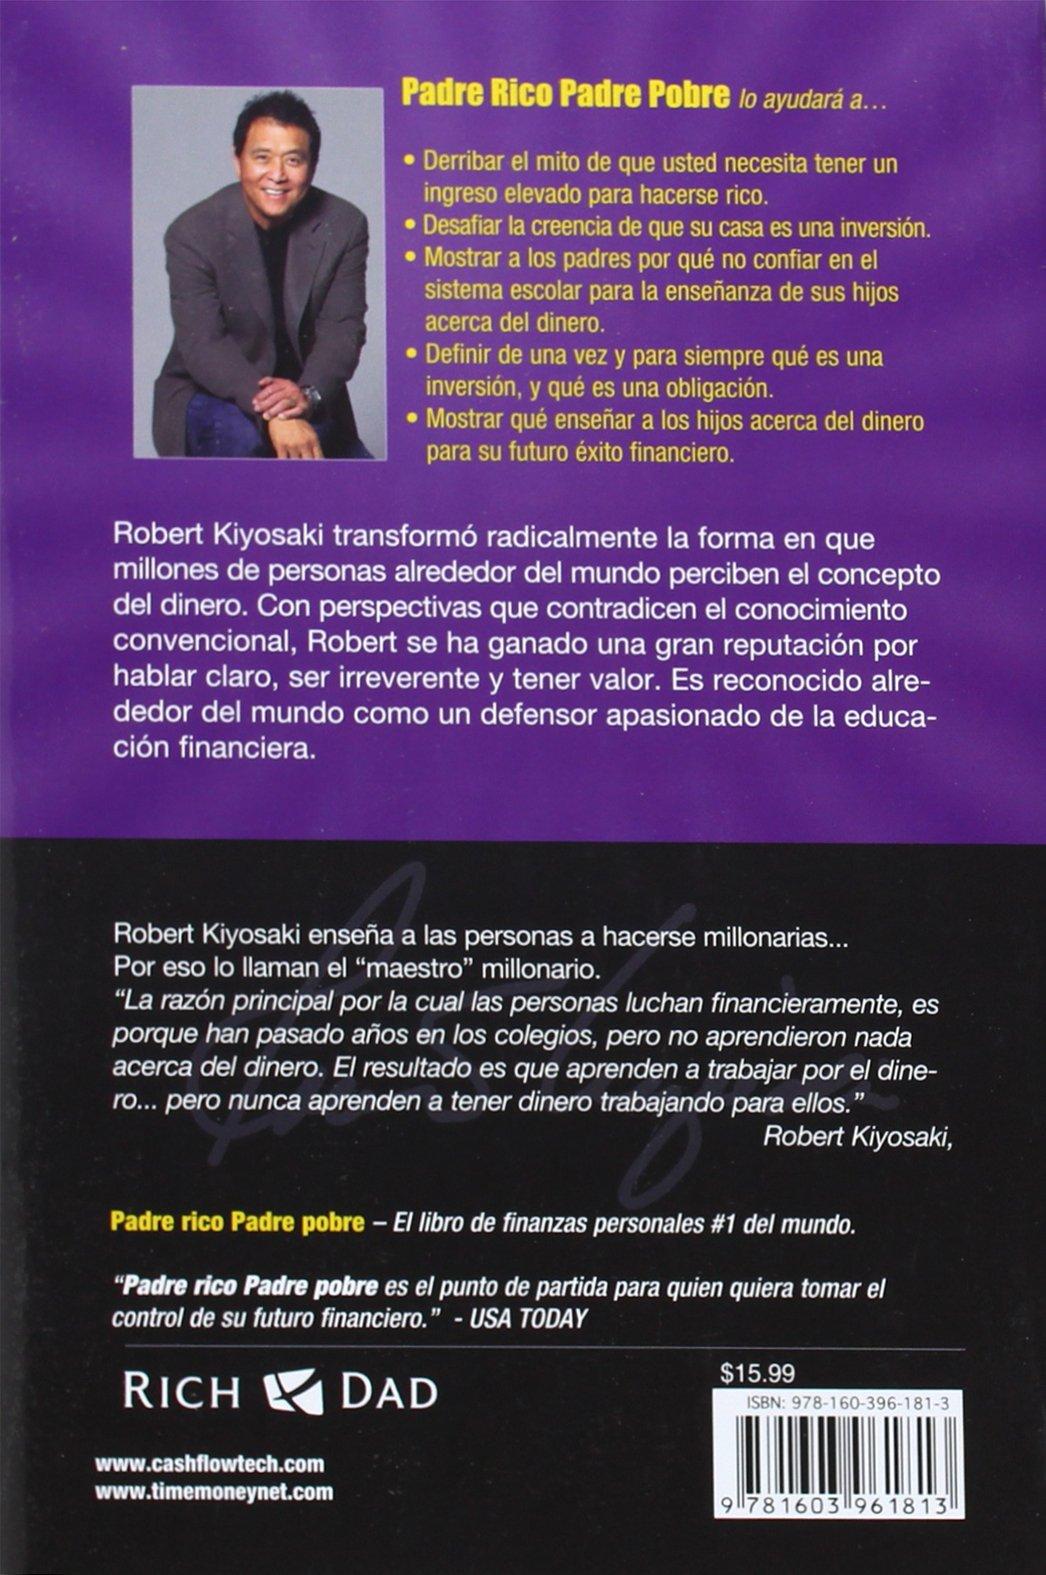 Padre Rico Padre Pobre Rich Dad Poor Dad Spanish Edition 9781603961813 Robert T Kiyosaki Sharon L Lechter Fernando Alvarez Del Castillo Books